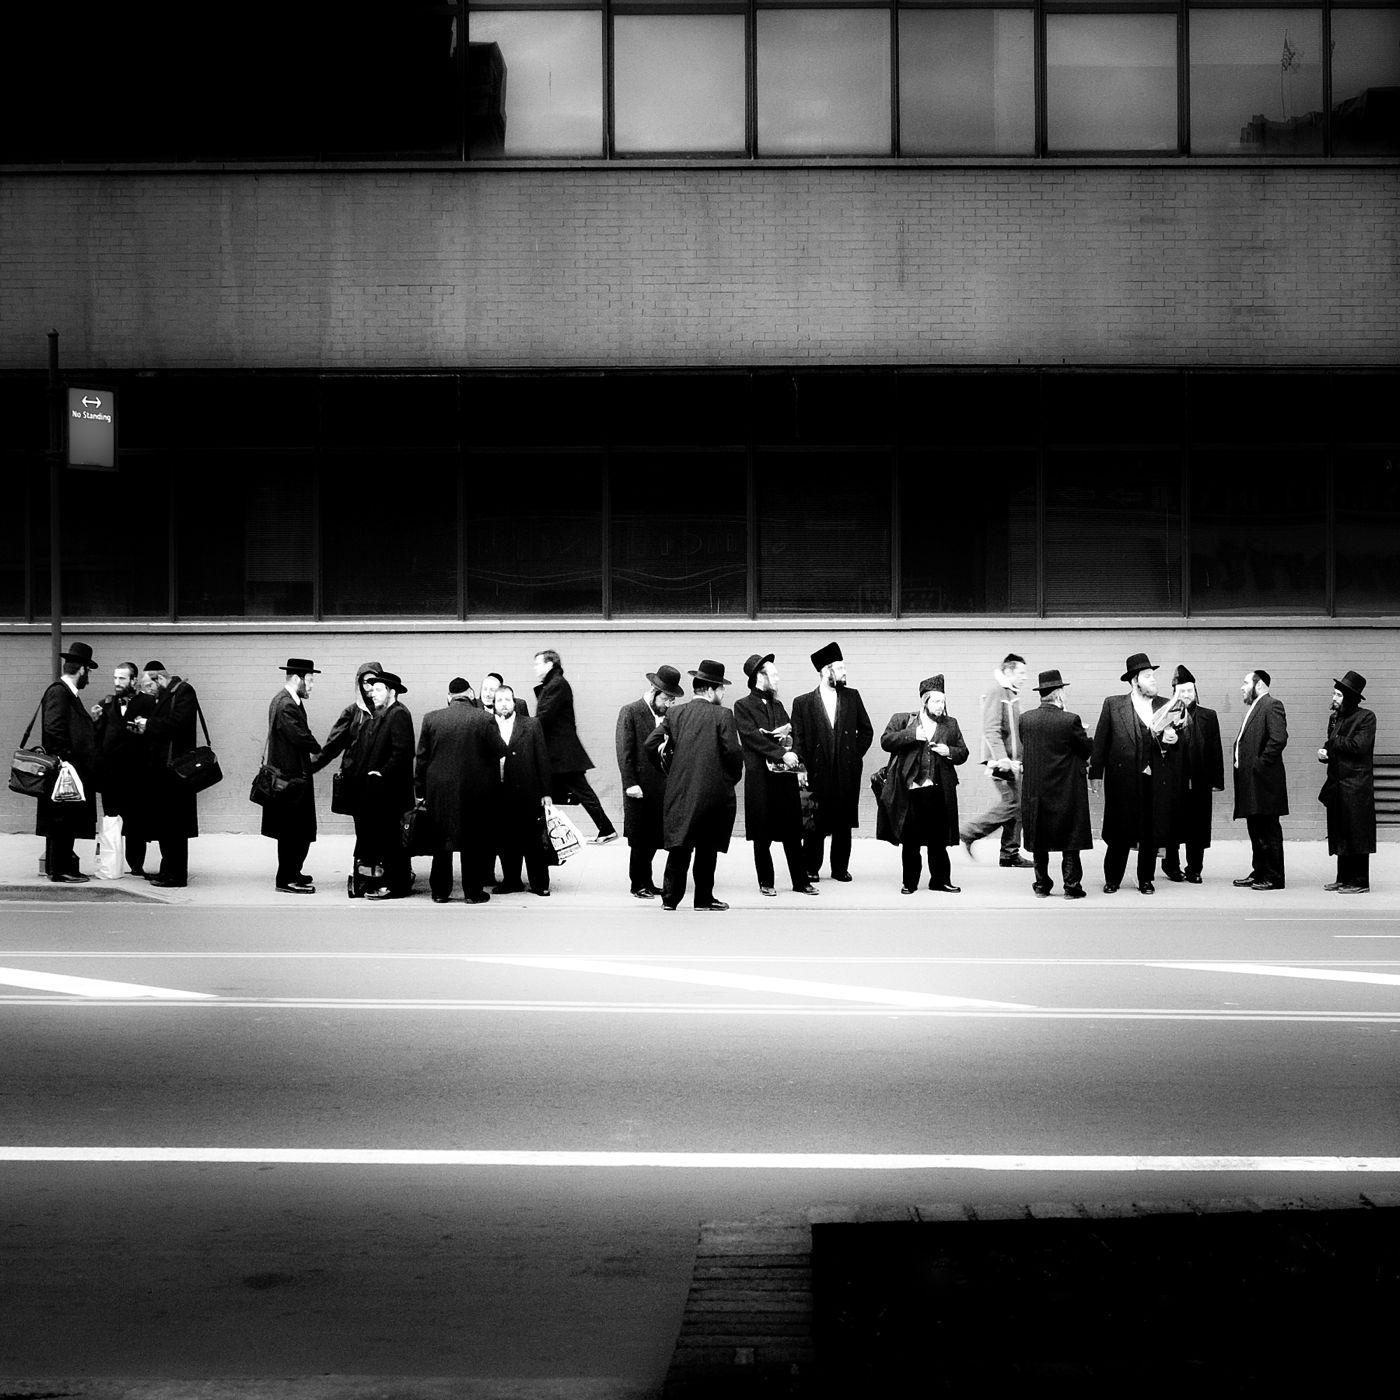 People On The Street, Philadelphia to NYC